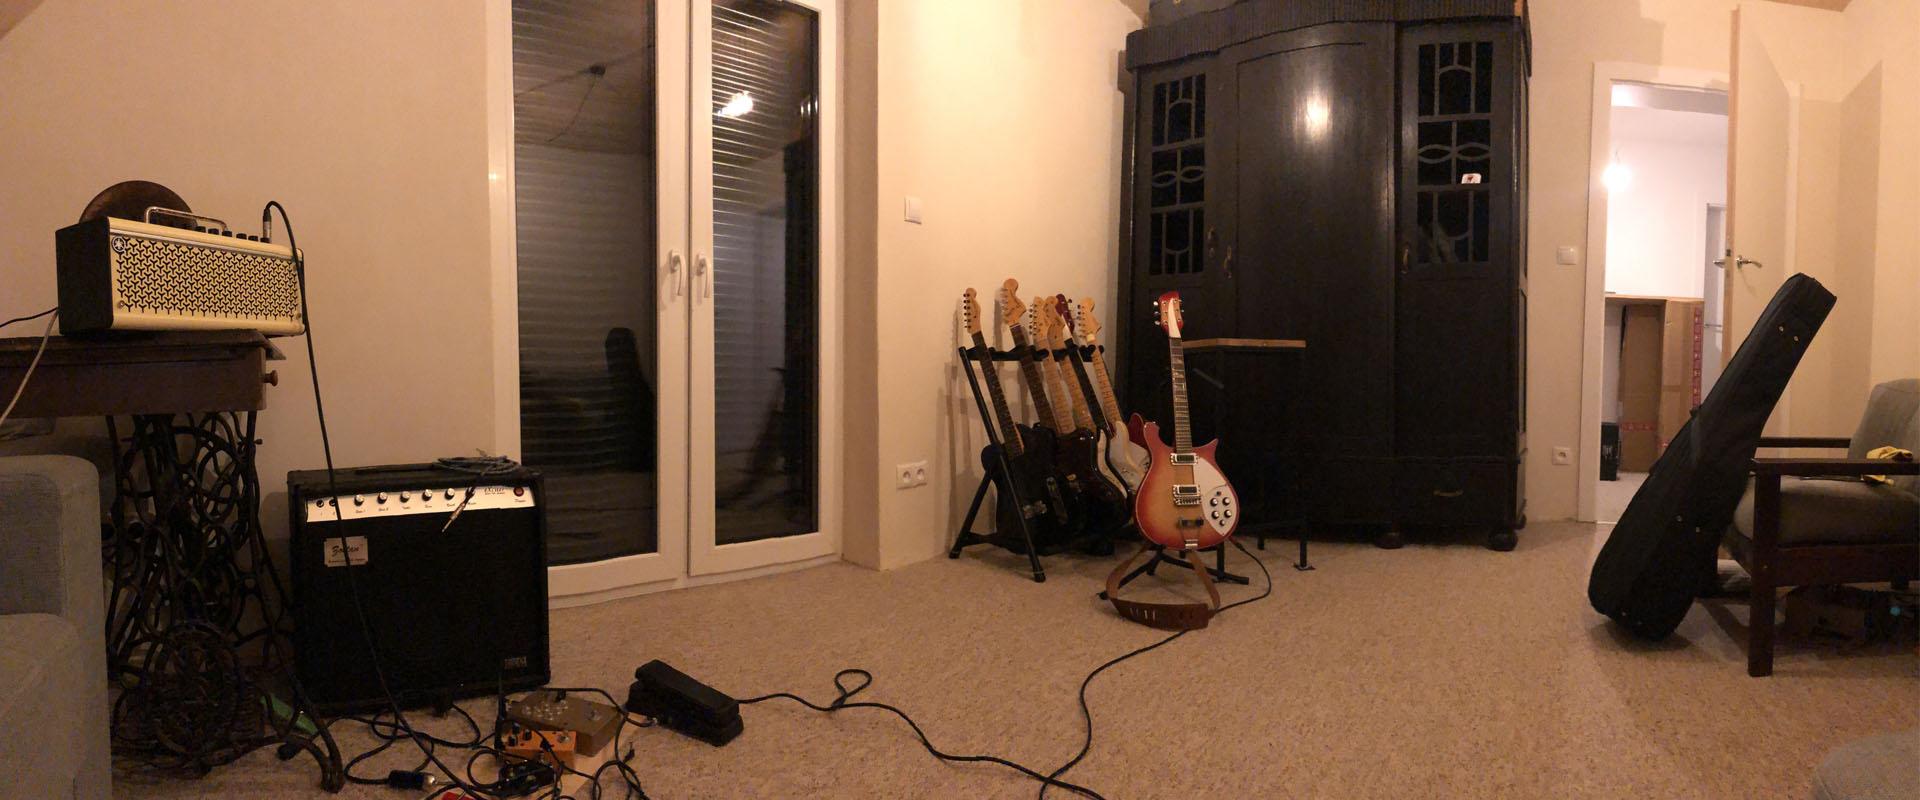 The PolishedGuitars.com store interior. Store with vintage guitars